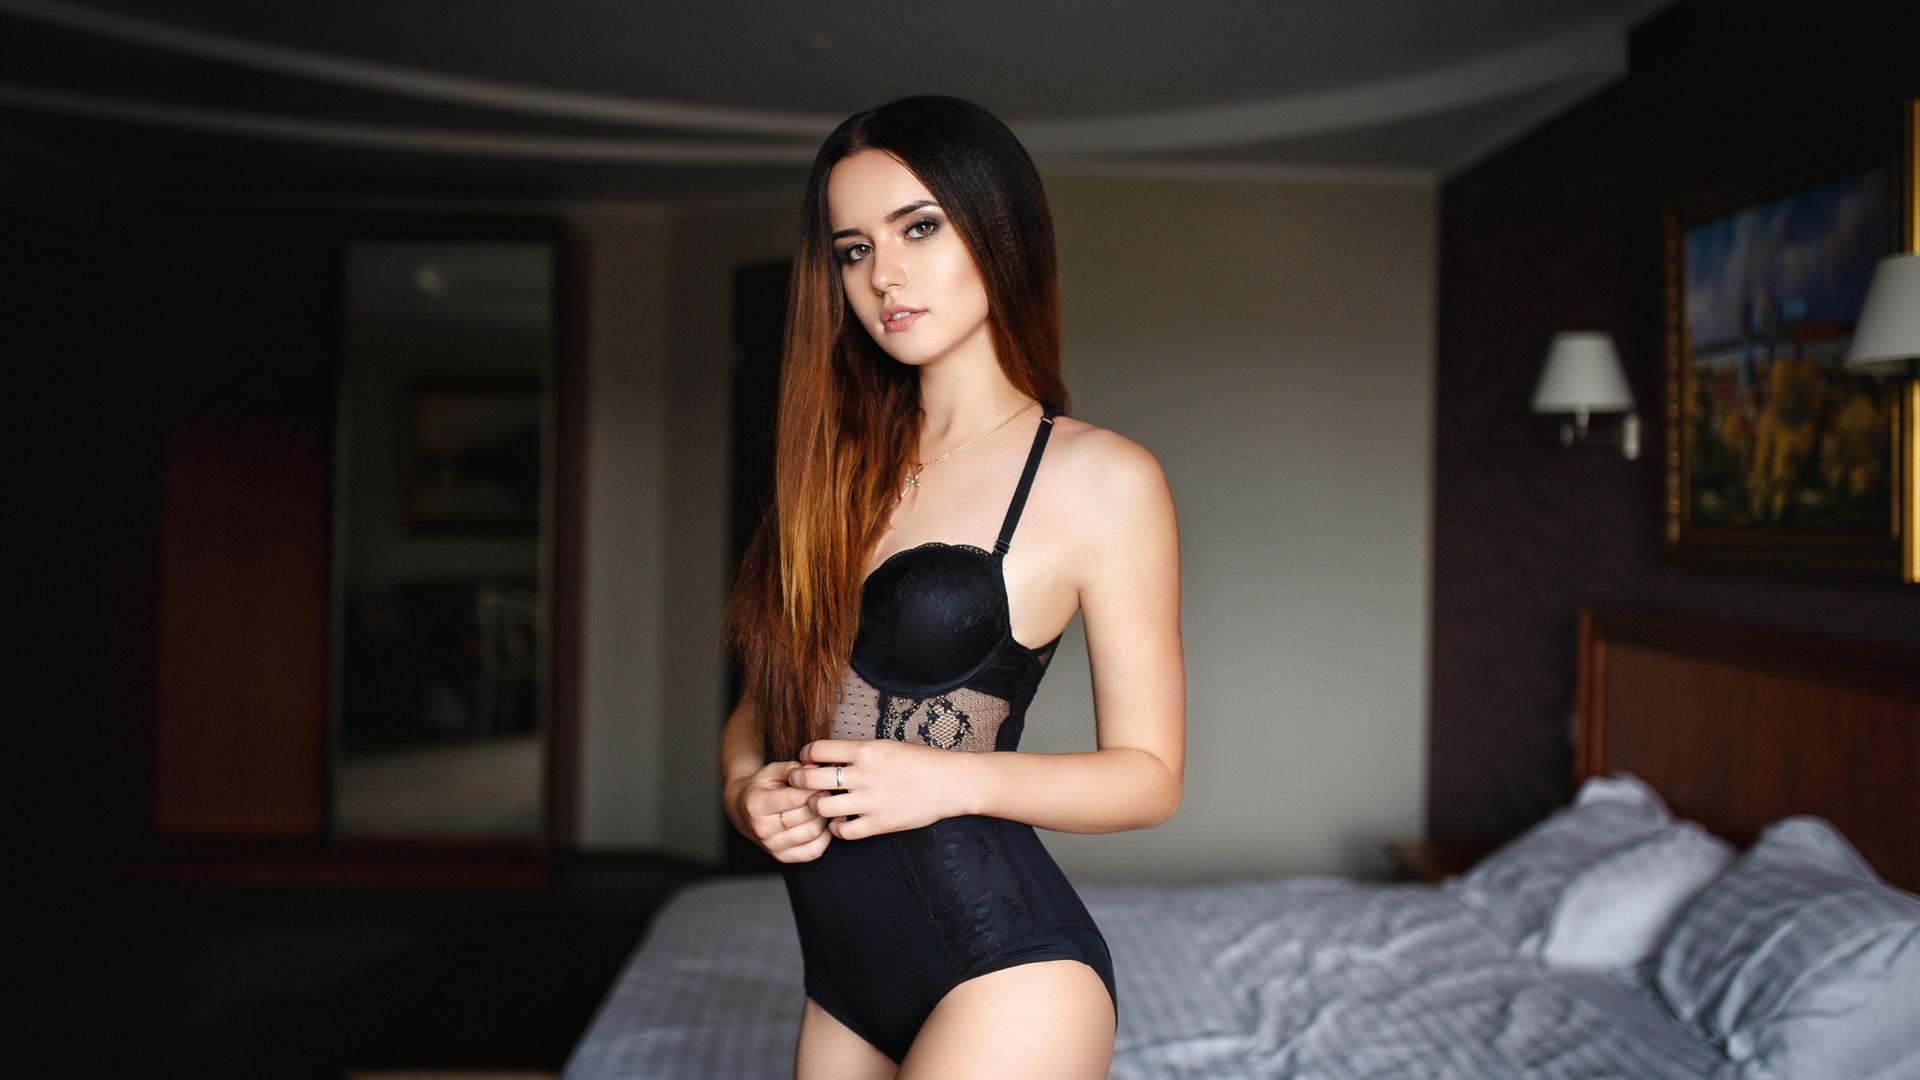 Free porn xnxx escorter i sthlm